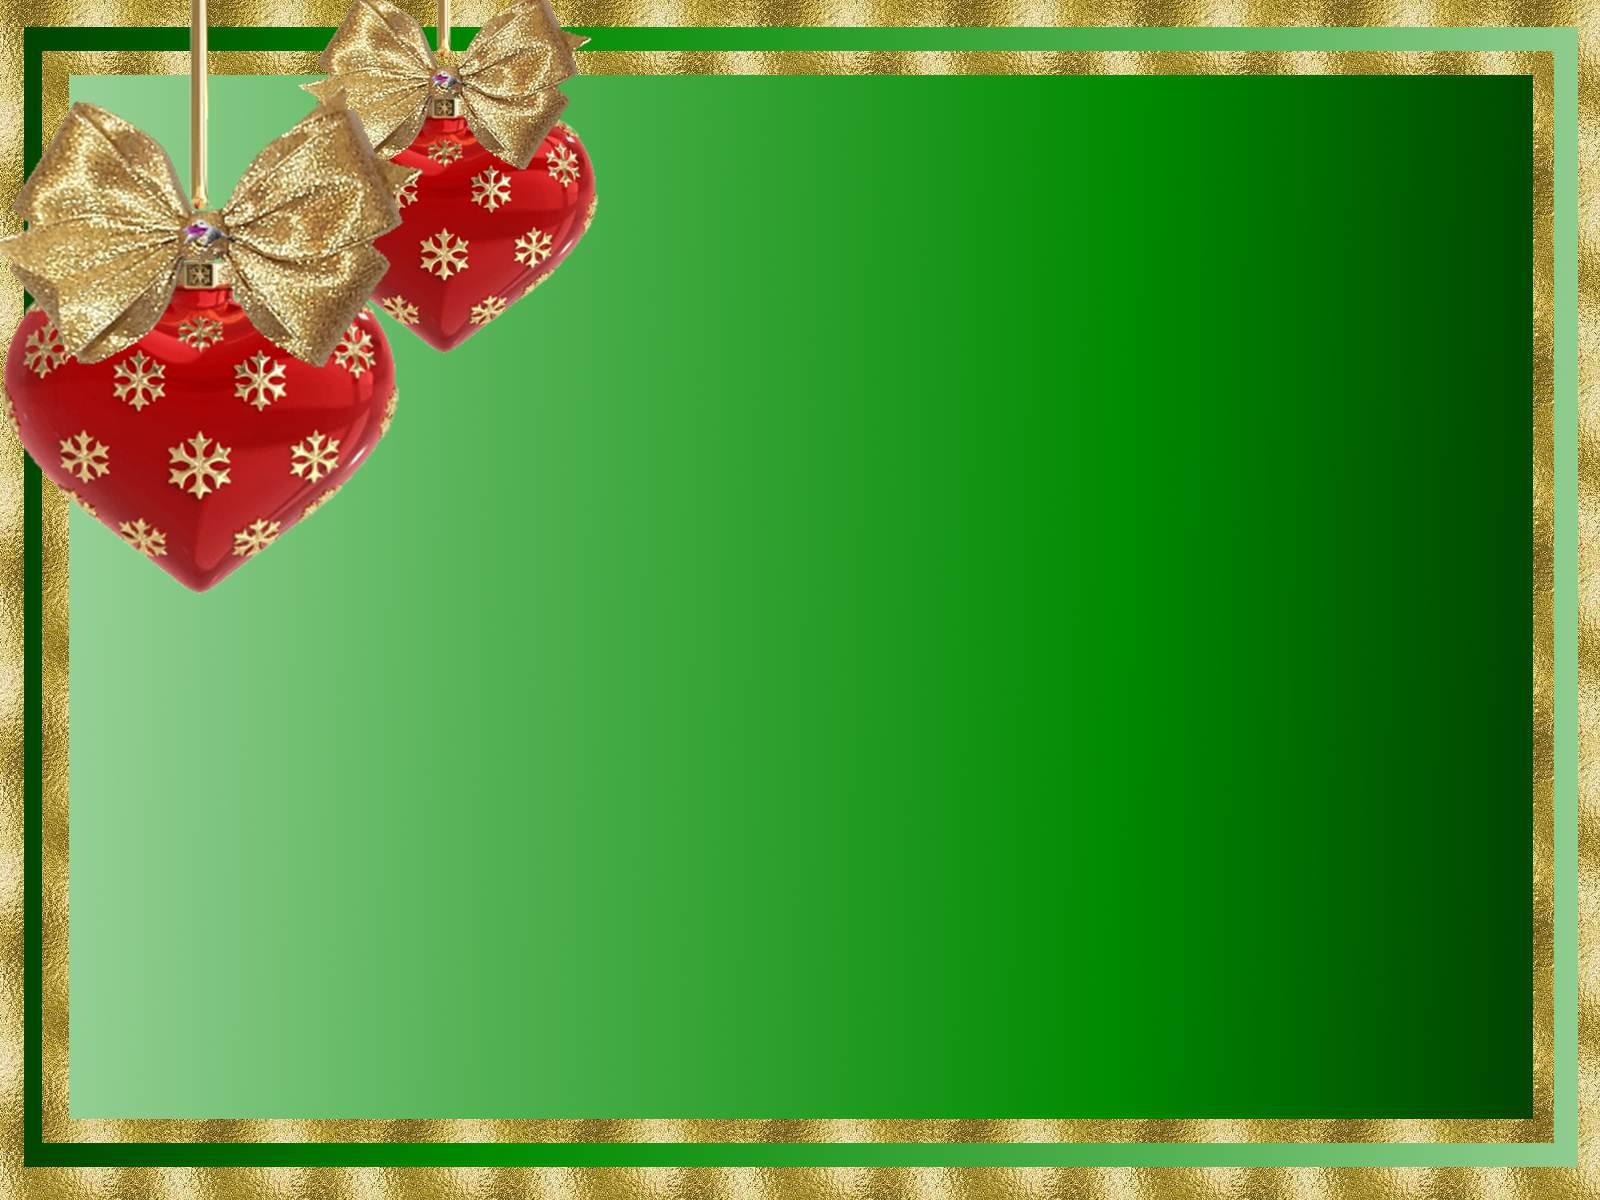 Christmas Santa Hd Wallpapers Fondos Para Hacer Tus Wallpapers De Navidad Christmas